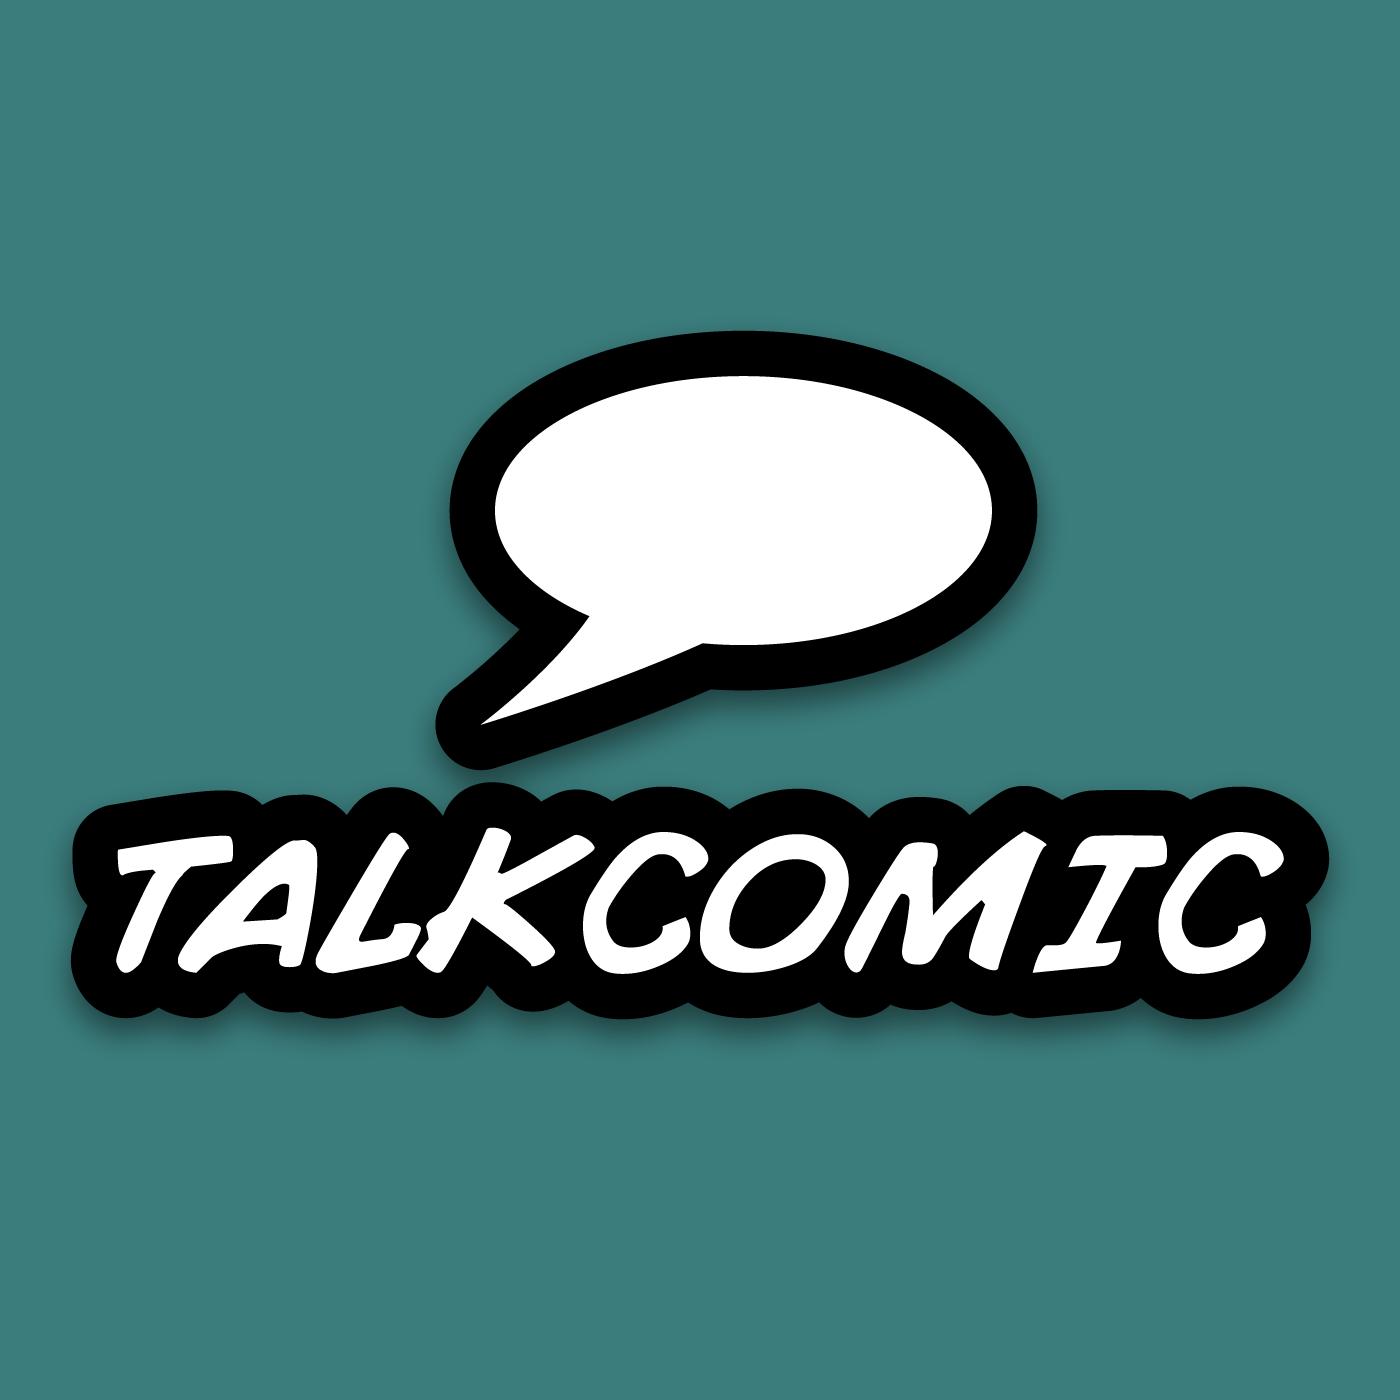 Talkcomic 講漫畫